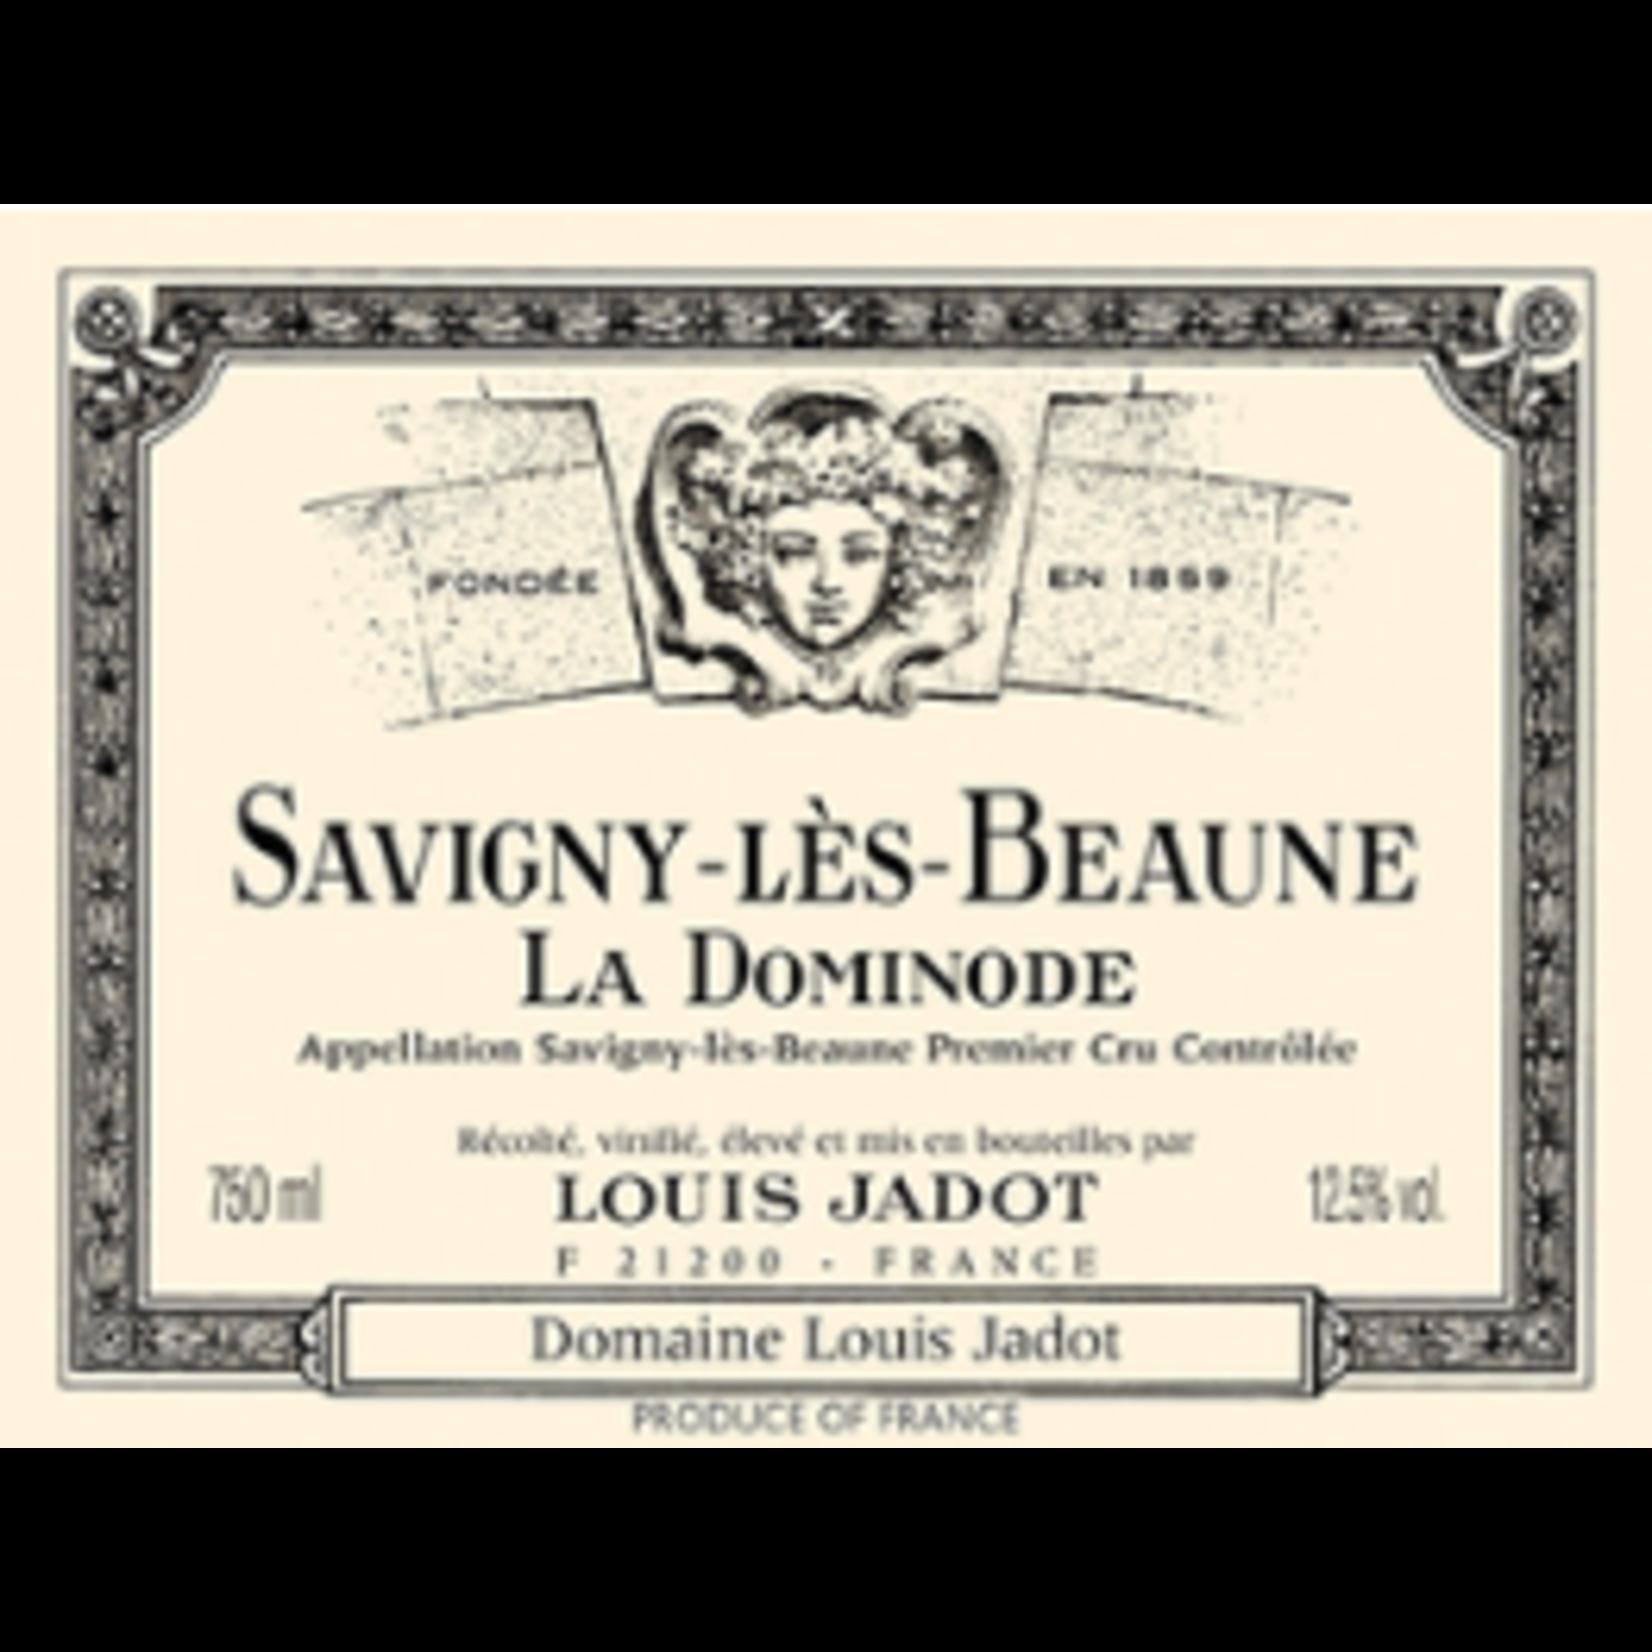 Wine Savigny-lès-Beaune 1er Cru La Dominode, Domaine Louis Jadot 2019